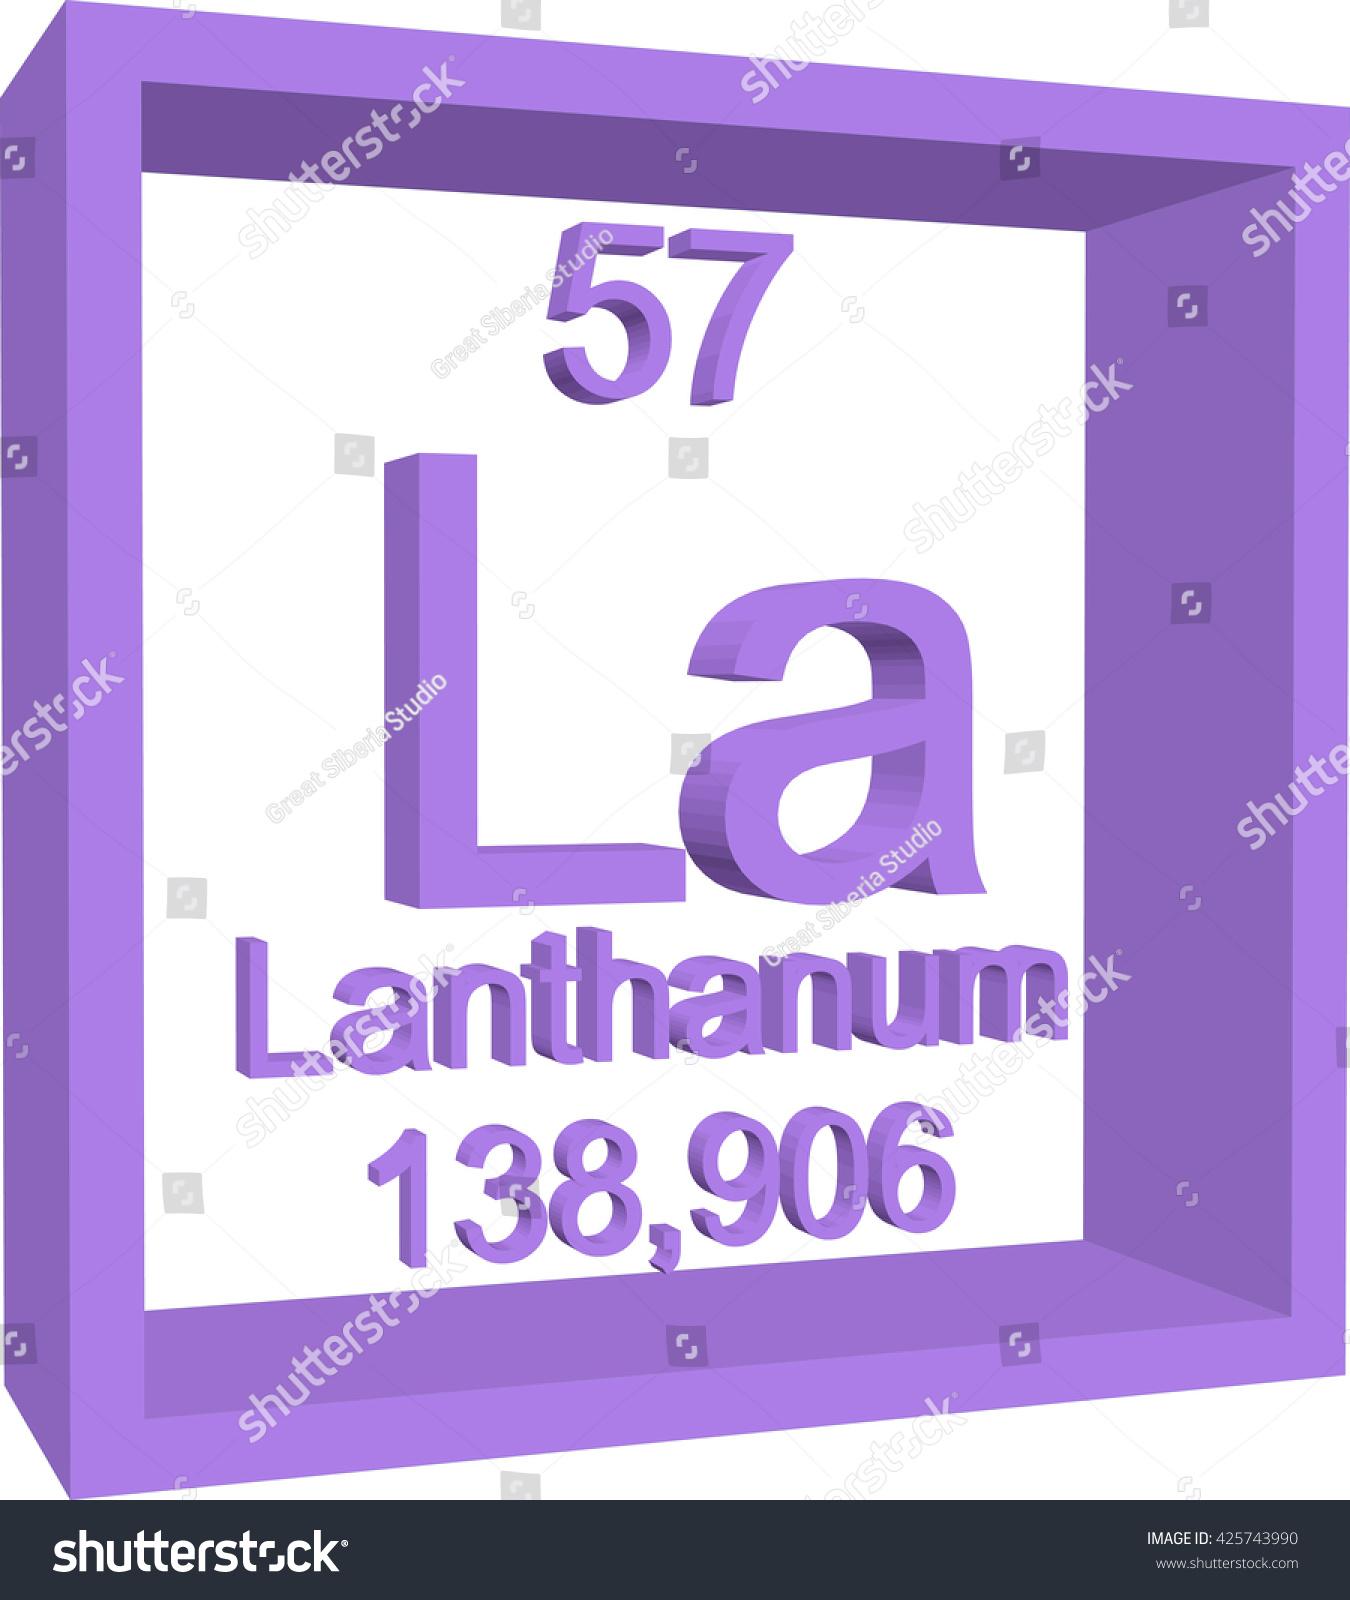 Lanthanium symbol element number 57 reverse osmosis membrane periodic table elements lanthanum stock vector 425743990 stock vector periodic table of elements lanthanum 425743990 periodic gamestrikefo Image collections